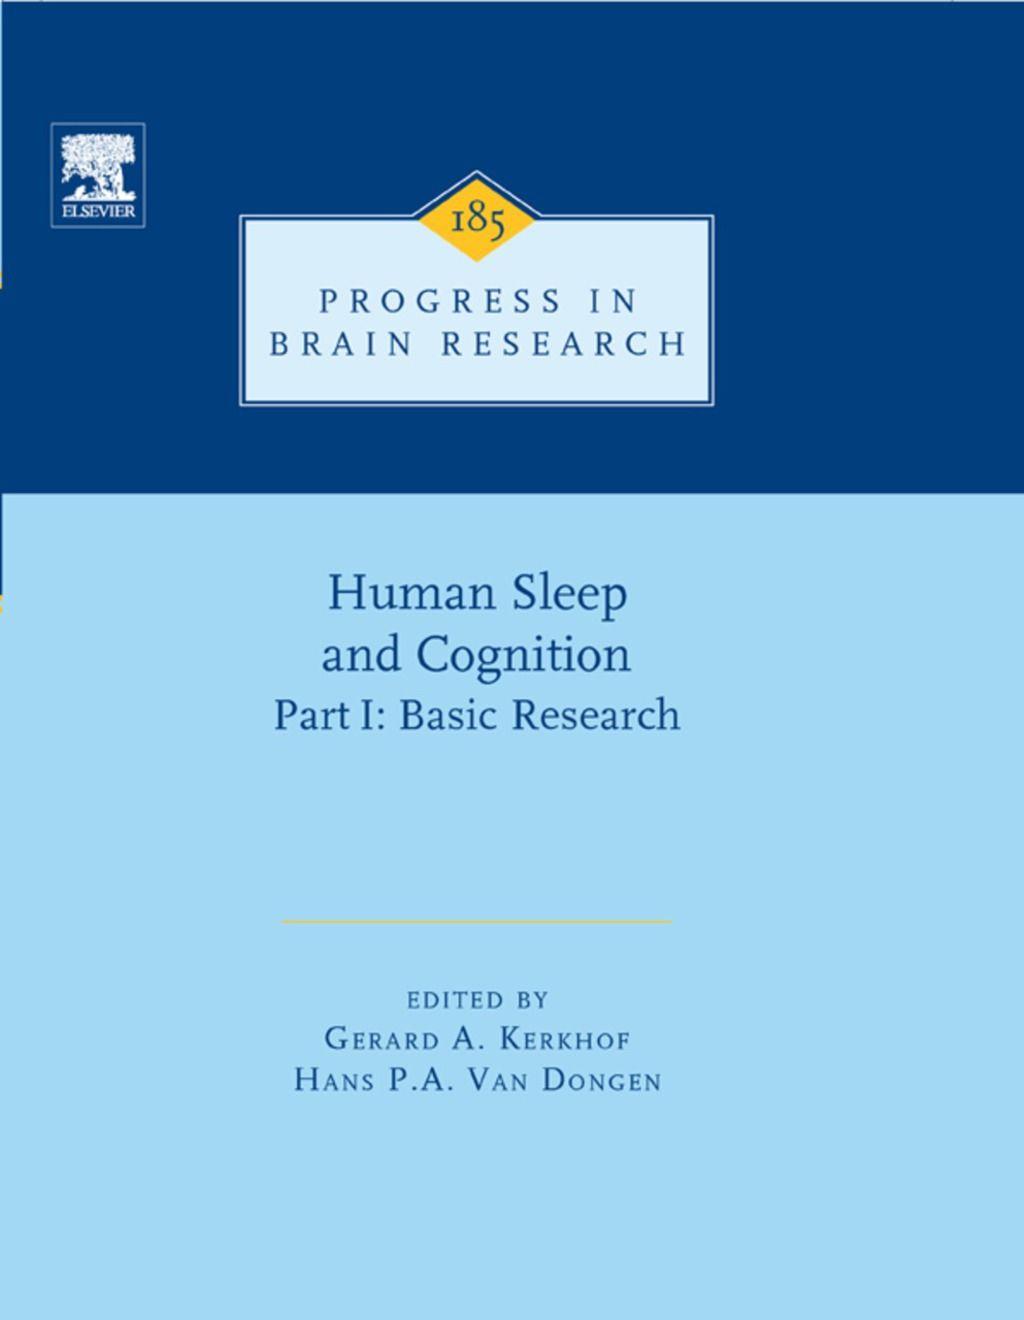 Human Sleep And Cognition Ebook